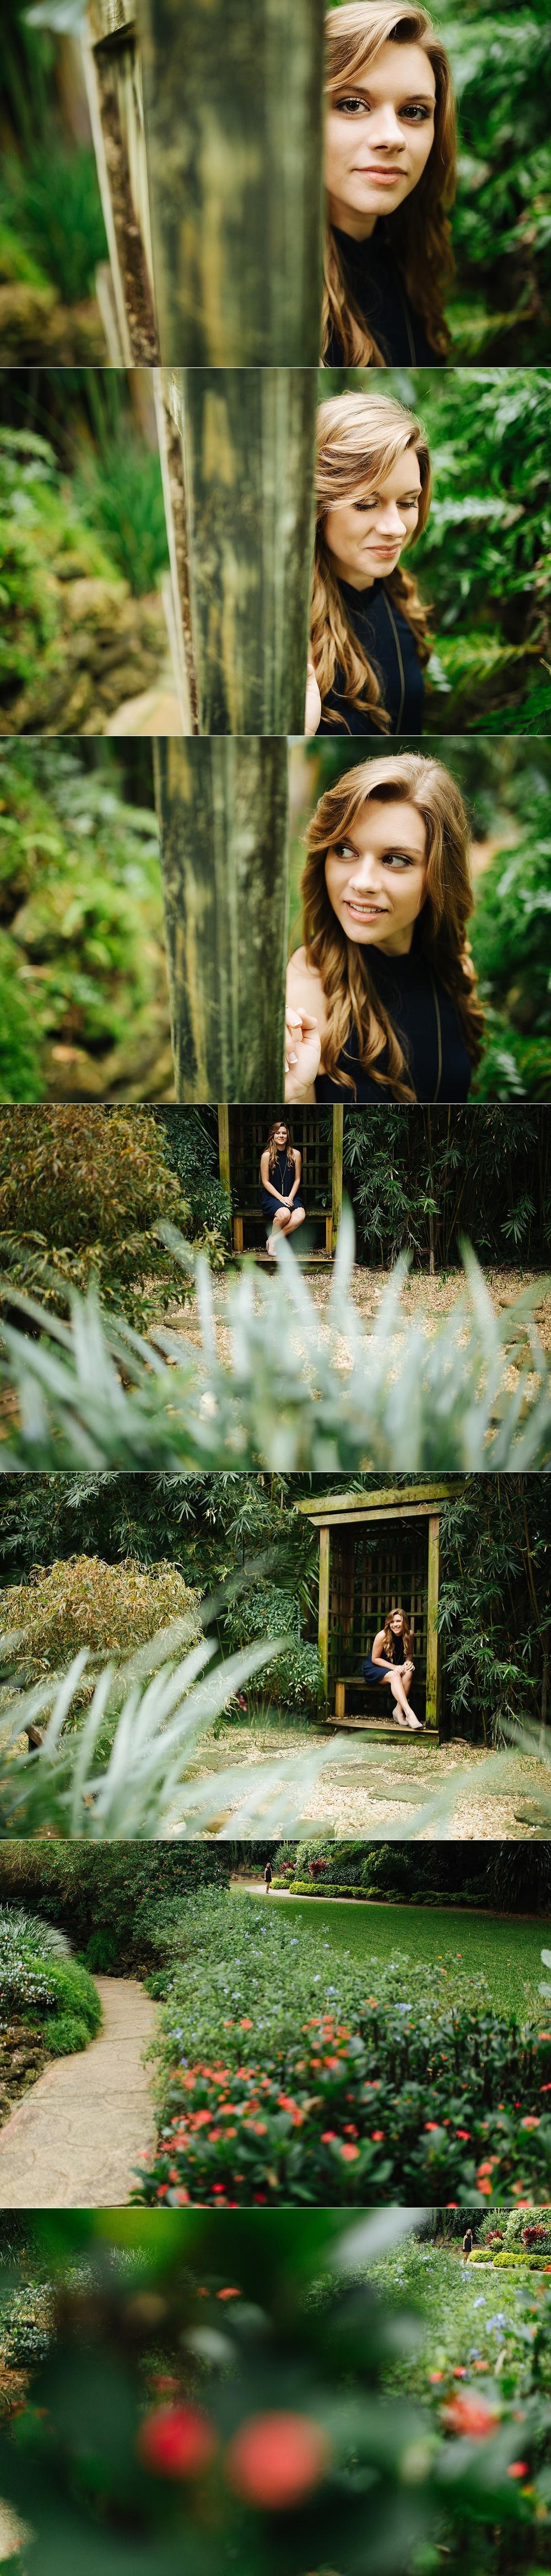 stpete senior portraits sunken gardens leah-14